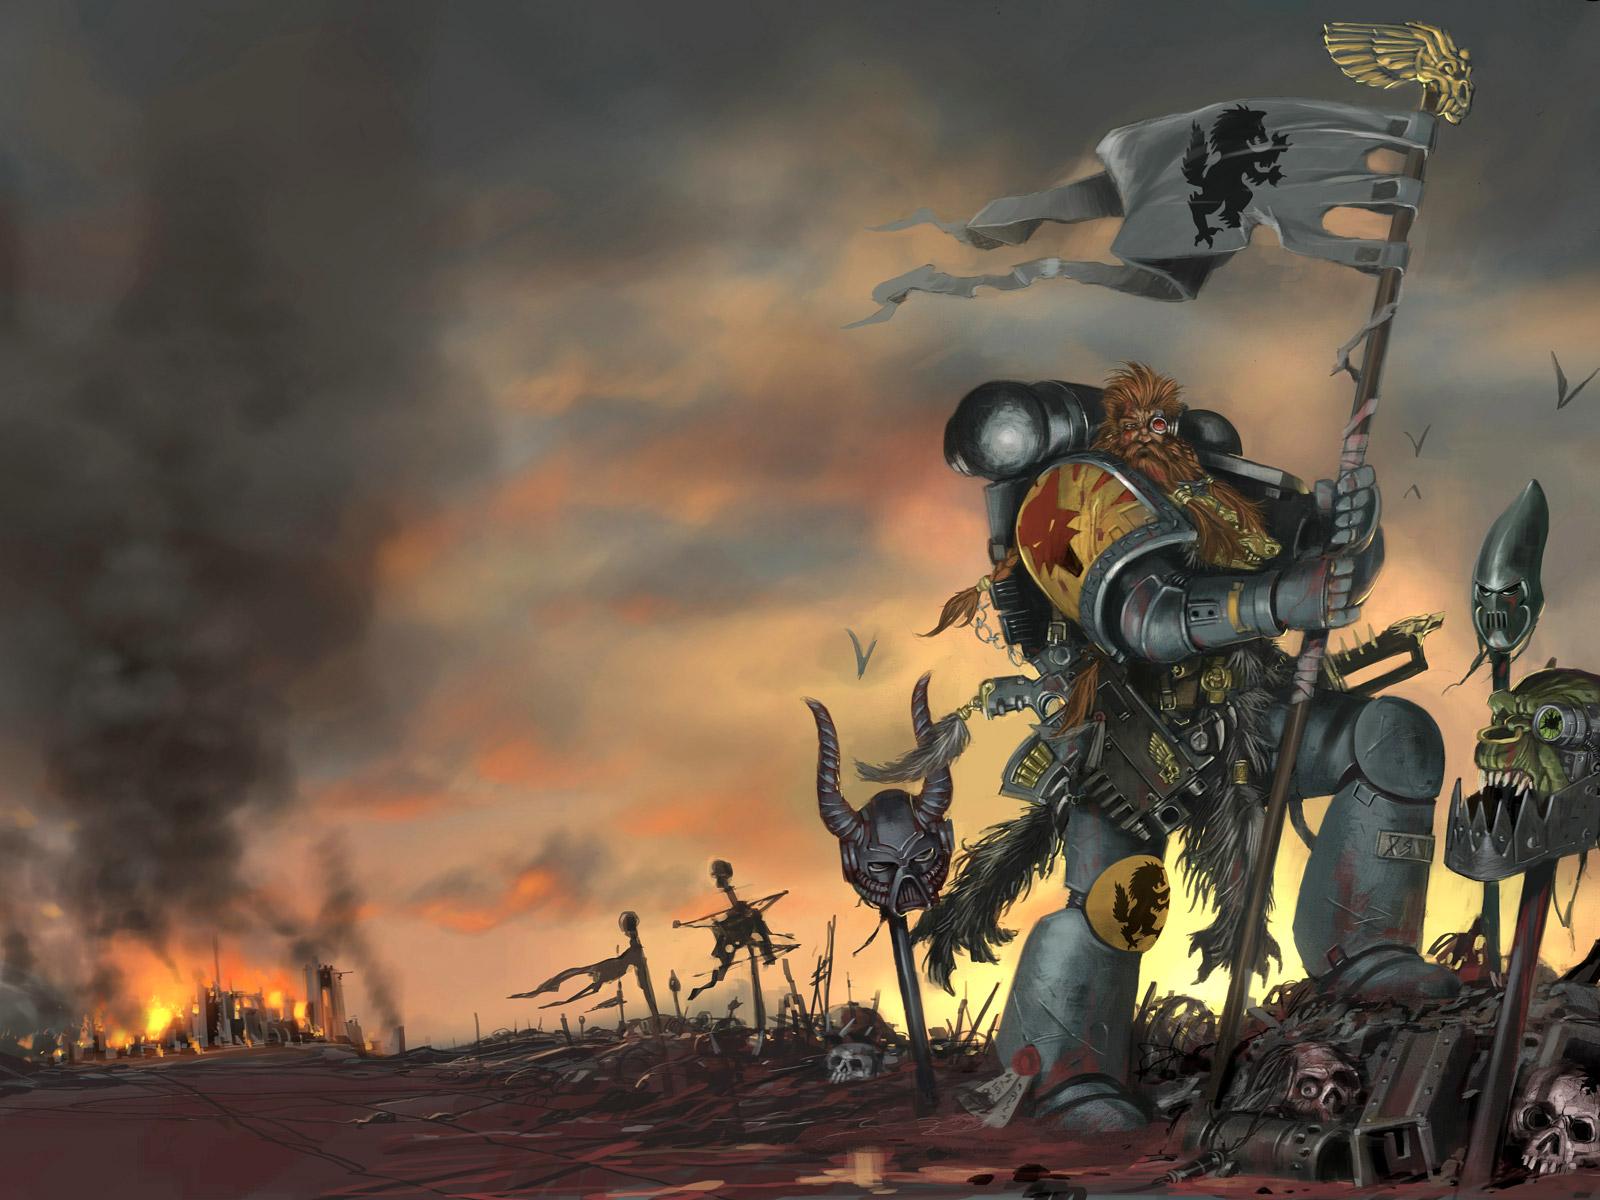 http://1.bp.blogspot.com/-mSDS73YzqJw/UTJNQ87QTXI/AAAAAAAAAxM/_3iSsobe4KE/s1600/Warhammer-40000-Space-Marine-HD-Wallpaper-Wide.jpg